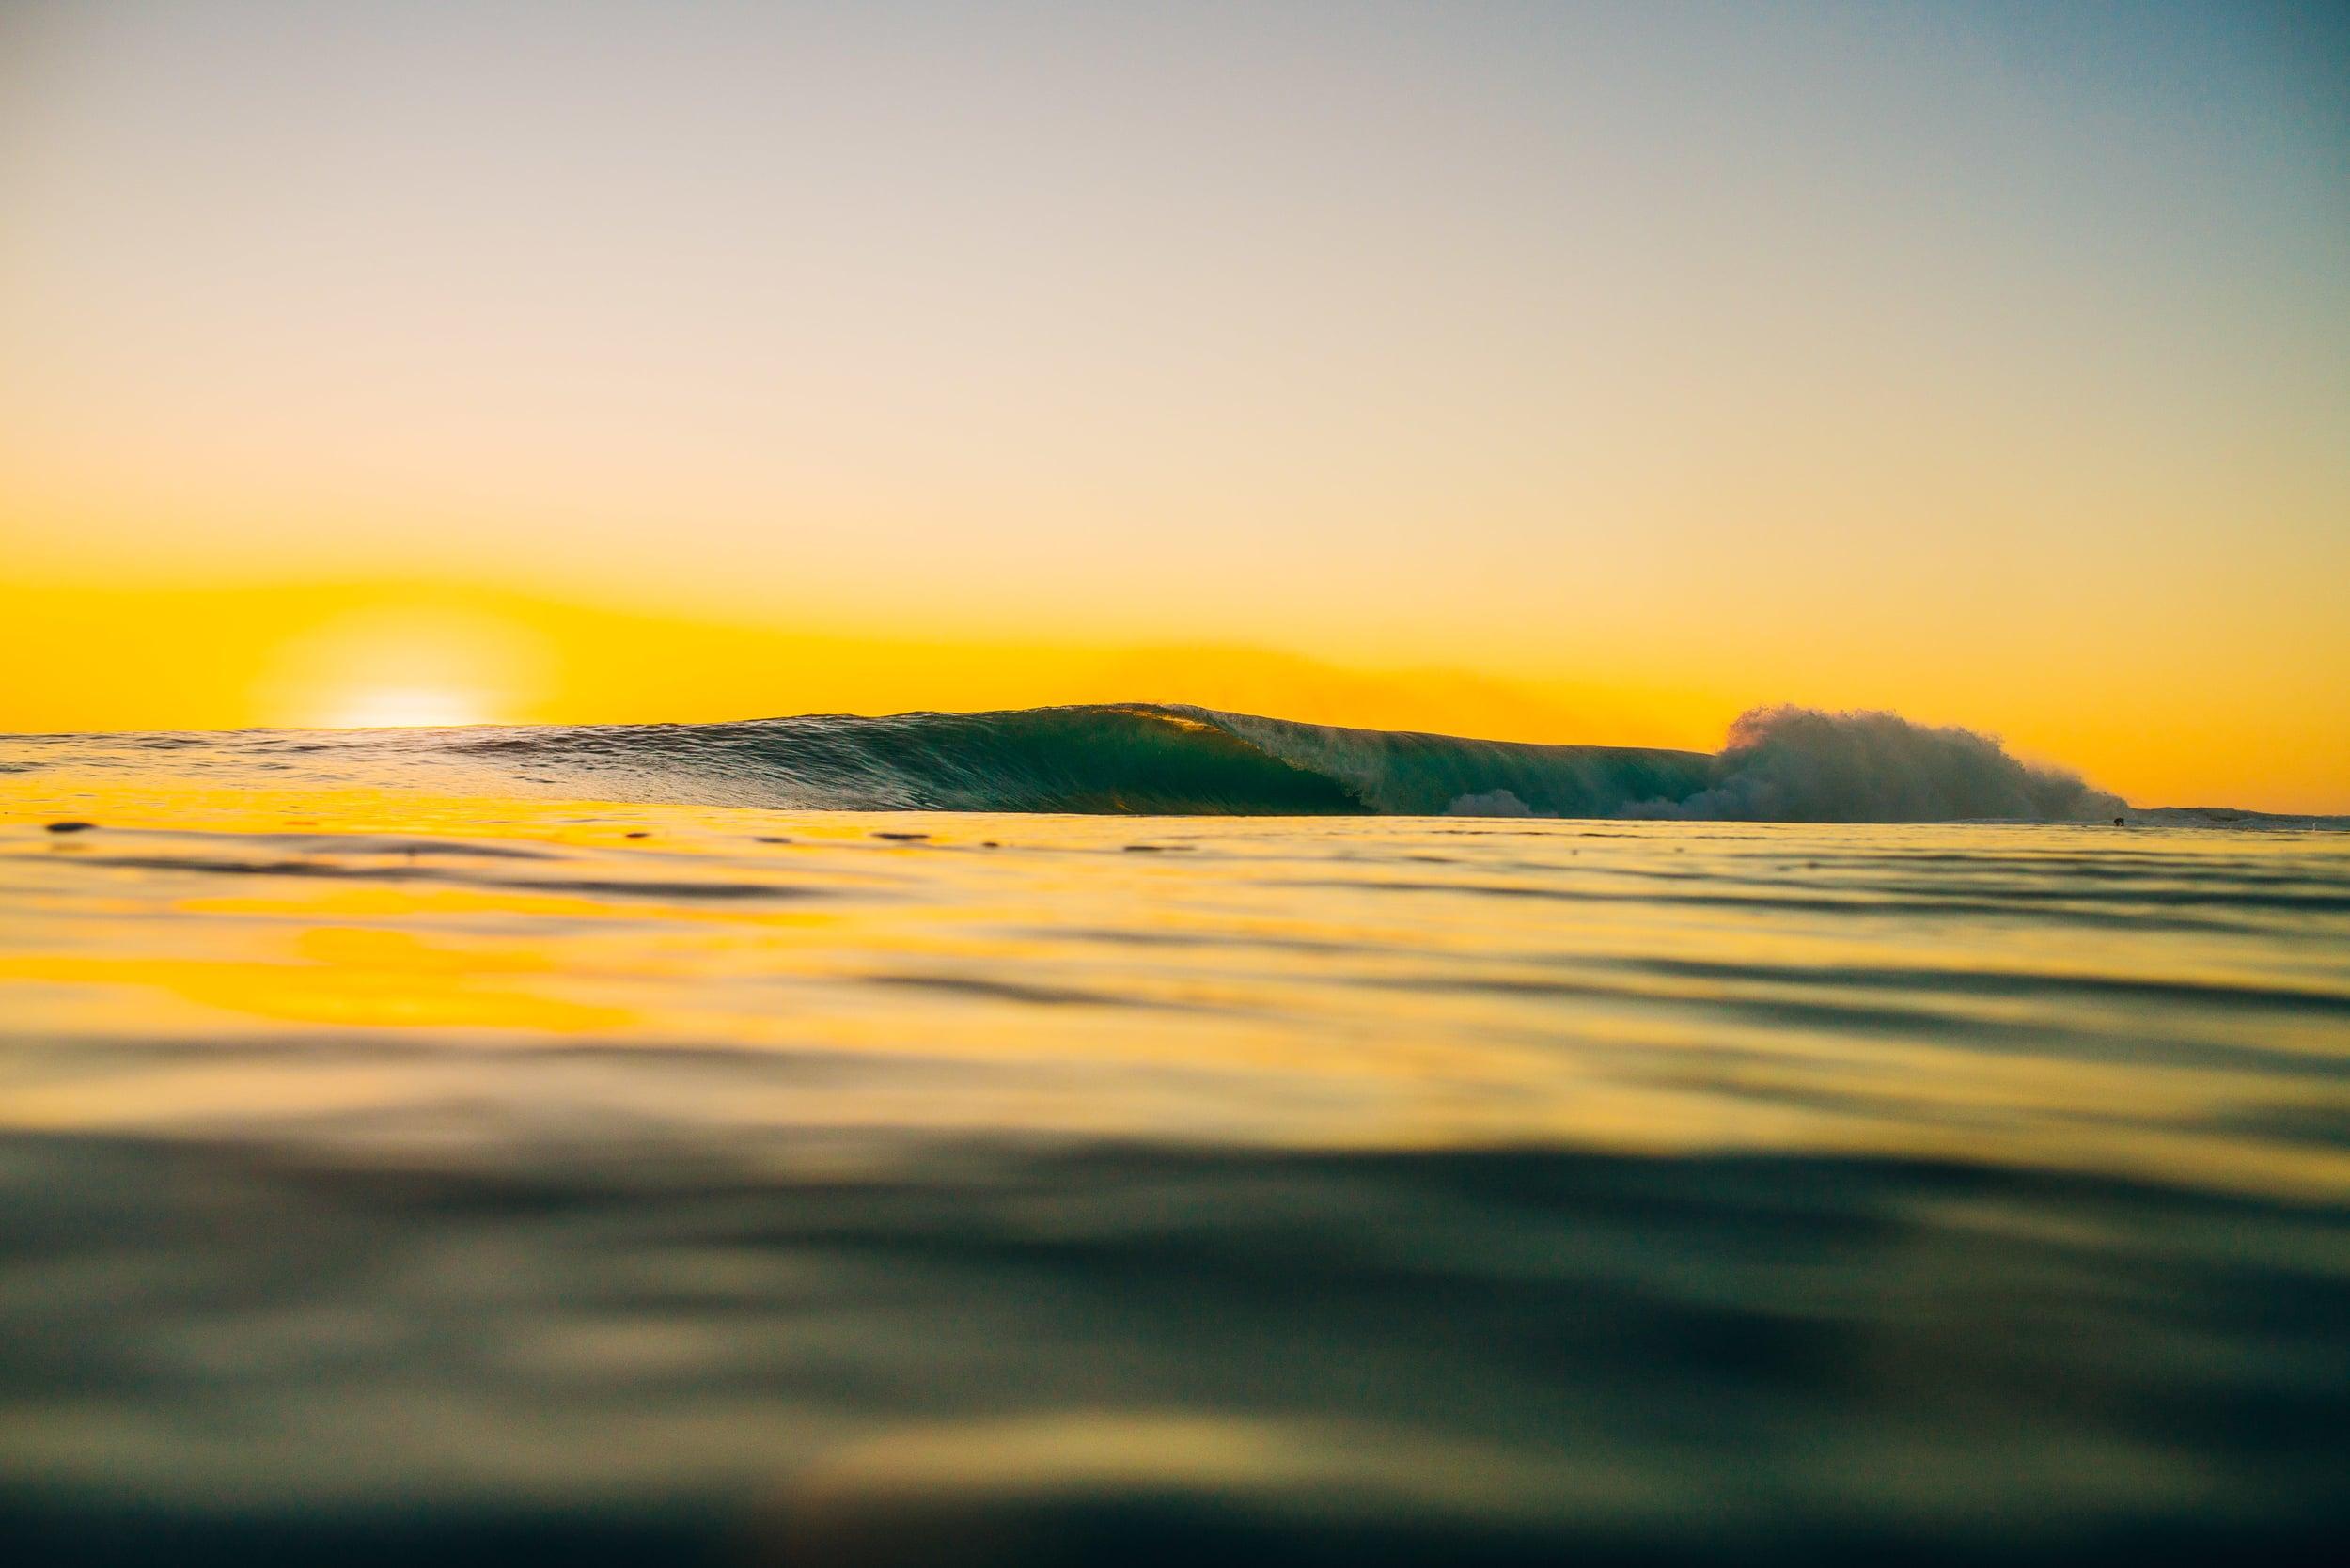 bryce-johnson-photography-kauai-hawaii-surfing-a7rii-aquatech-water-ocean-12.jpg